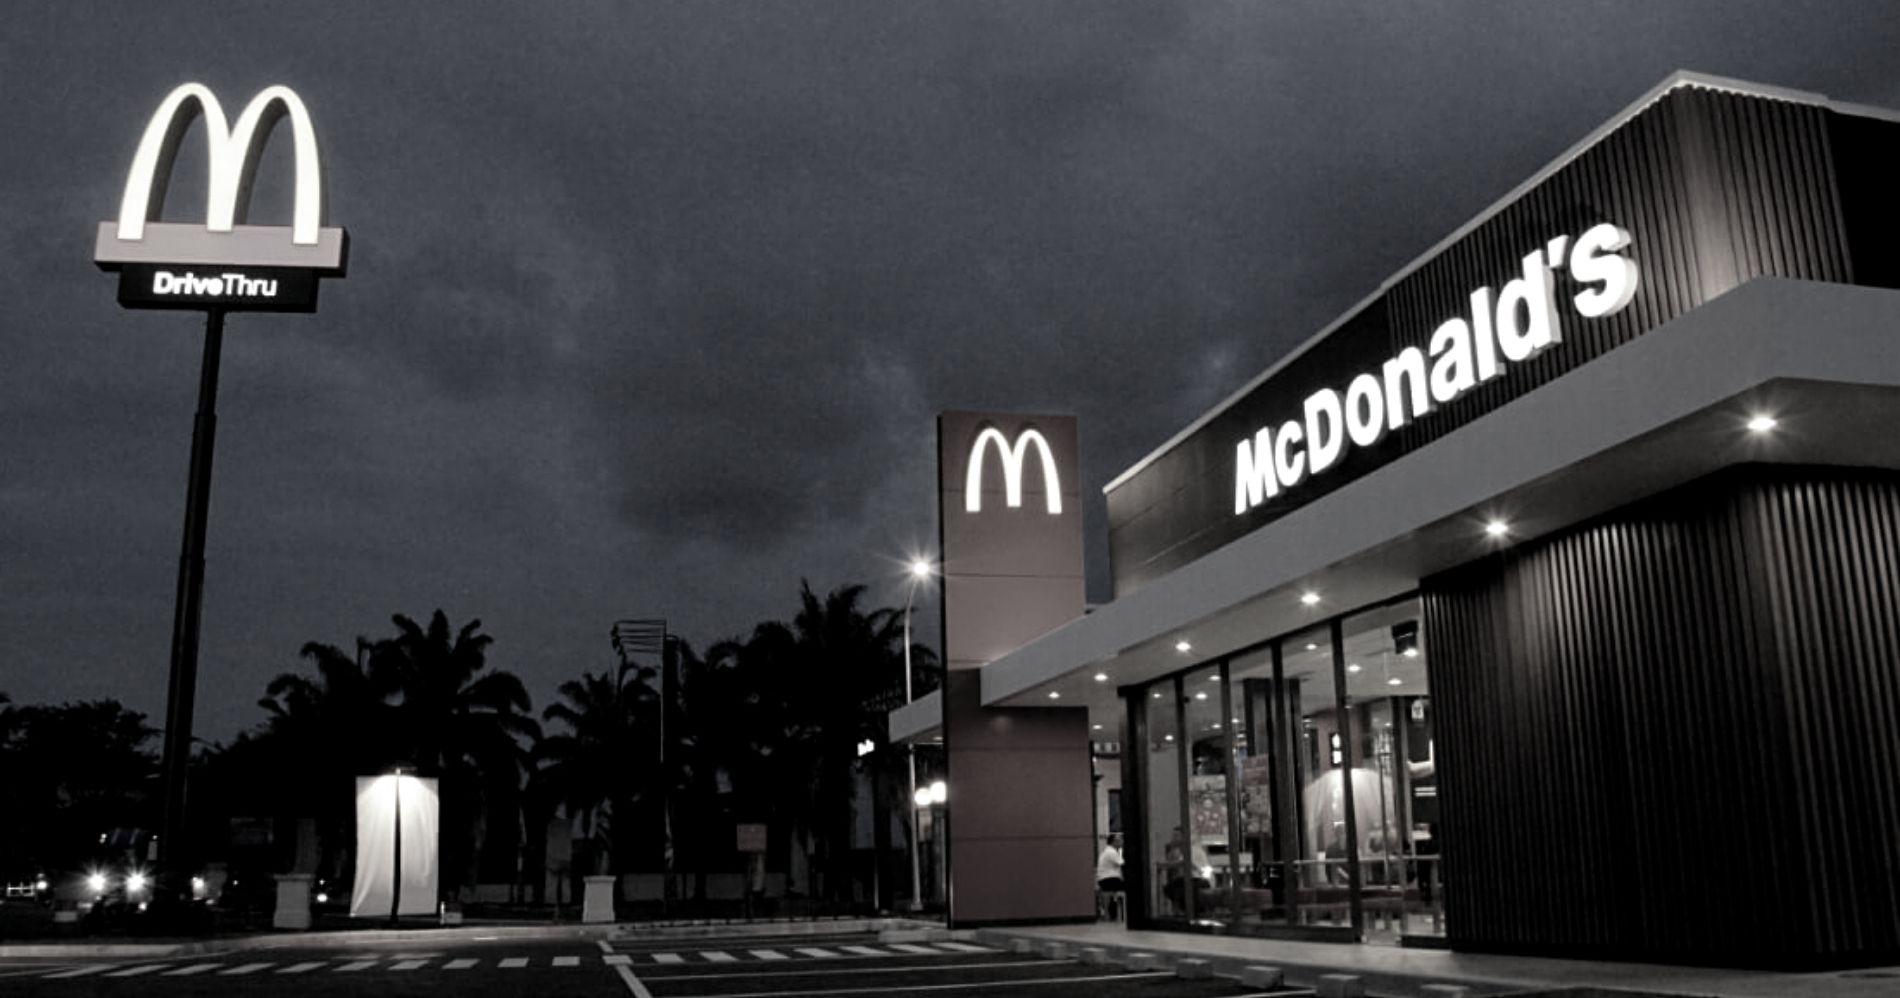 McDonald's Outlet Illustration Web Bisnis Muda - mcdonalds.co.id